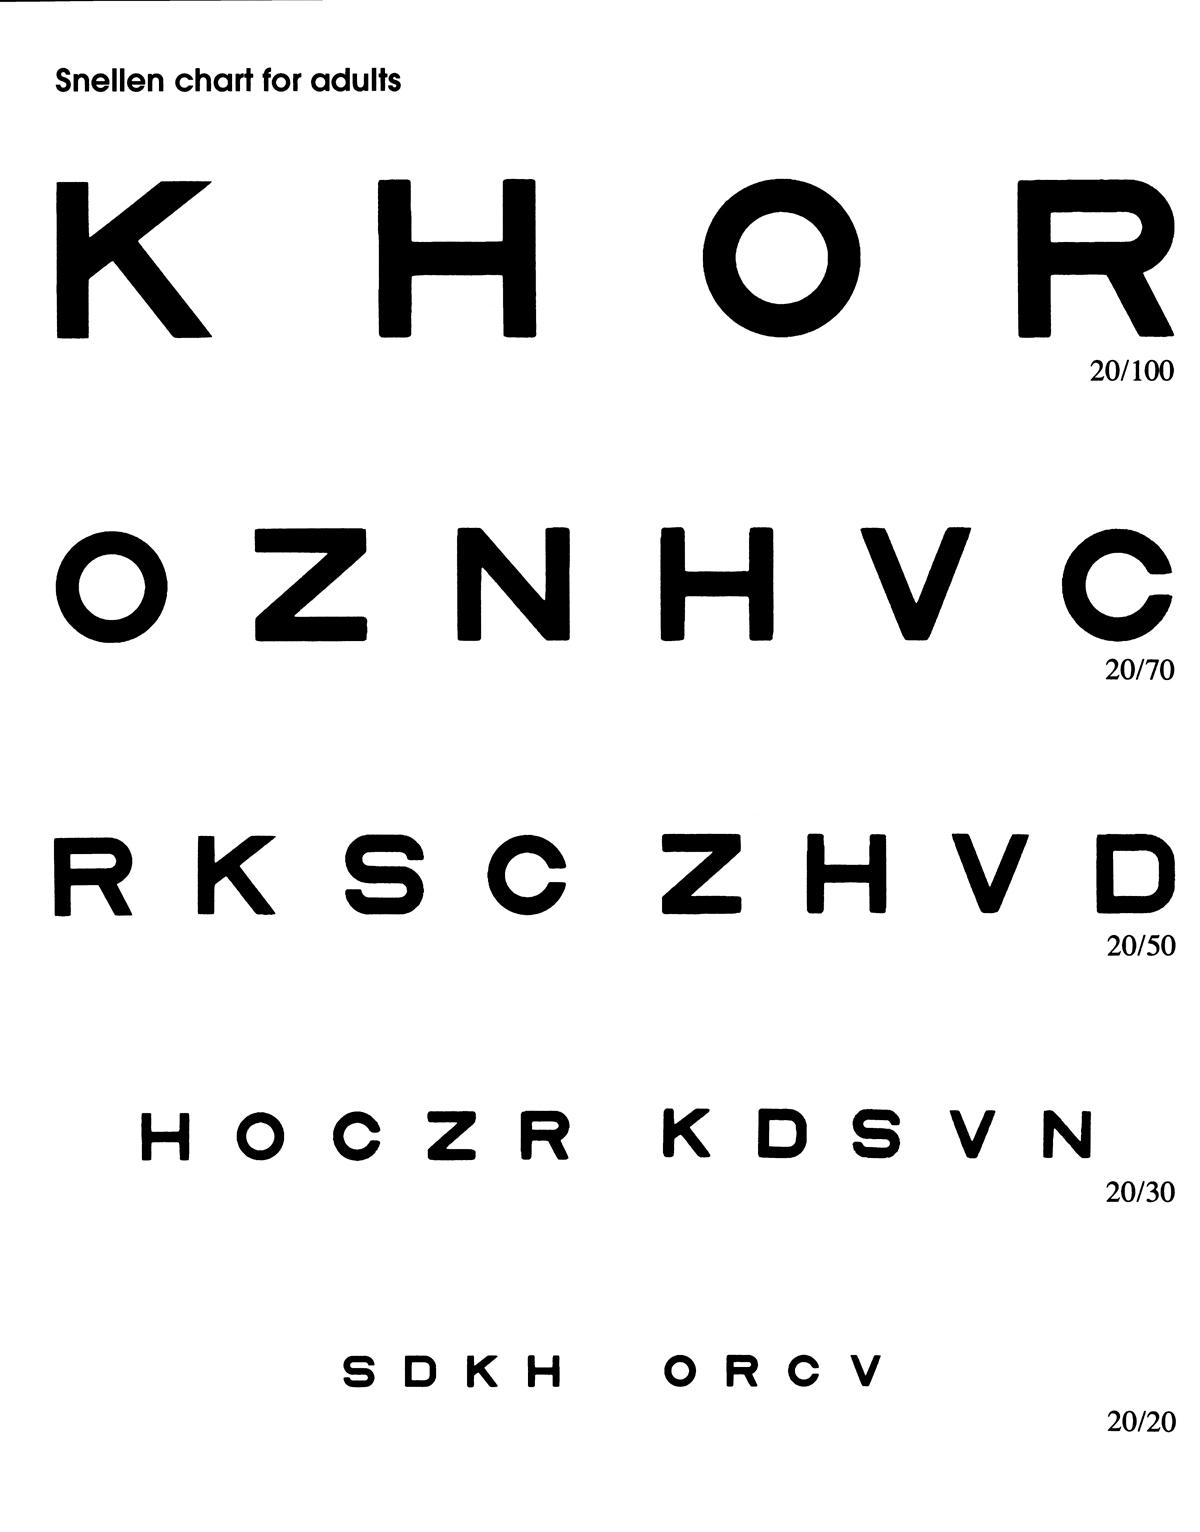 Adult eye examination askew eyewear nvjuhfo Gallery